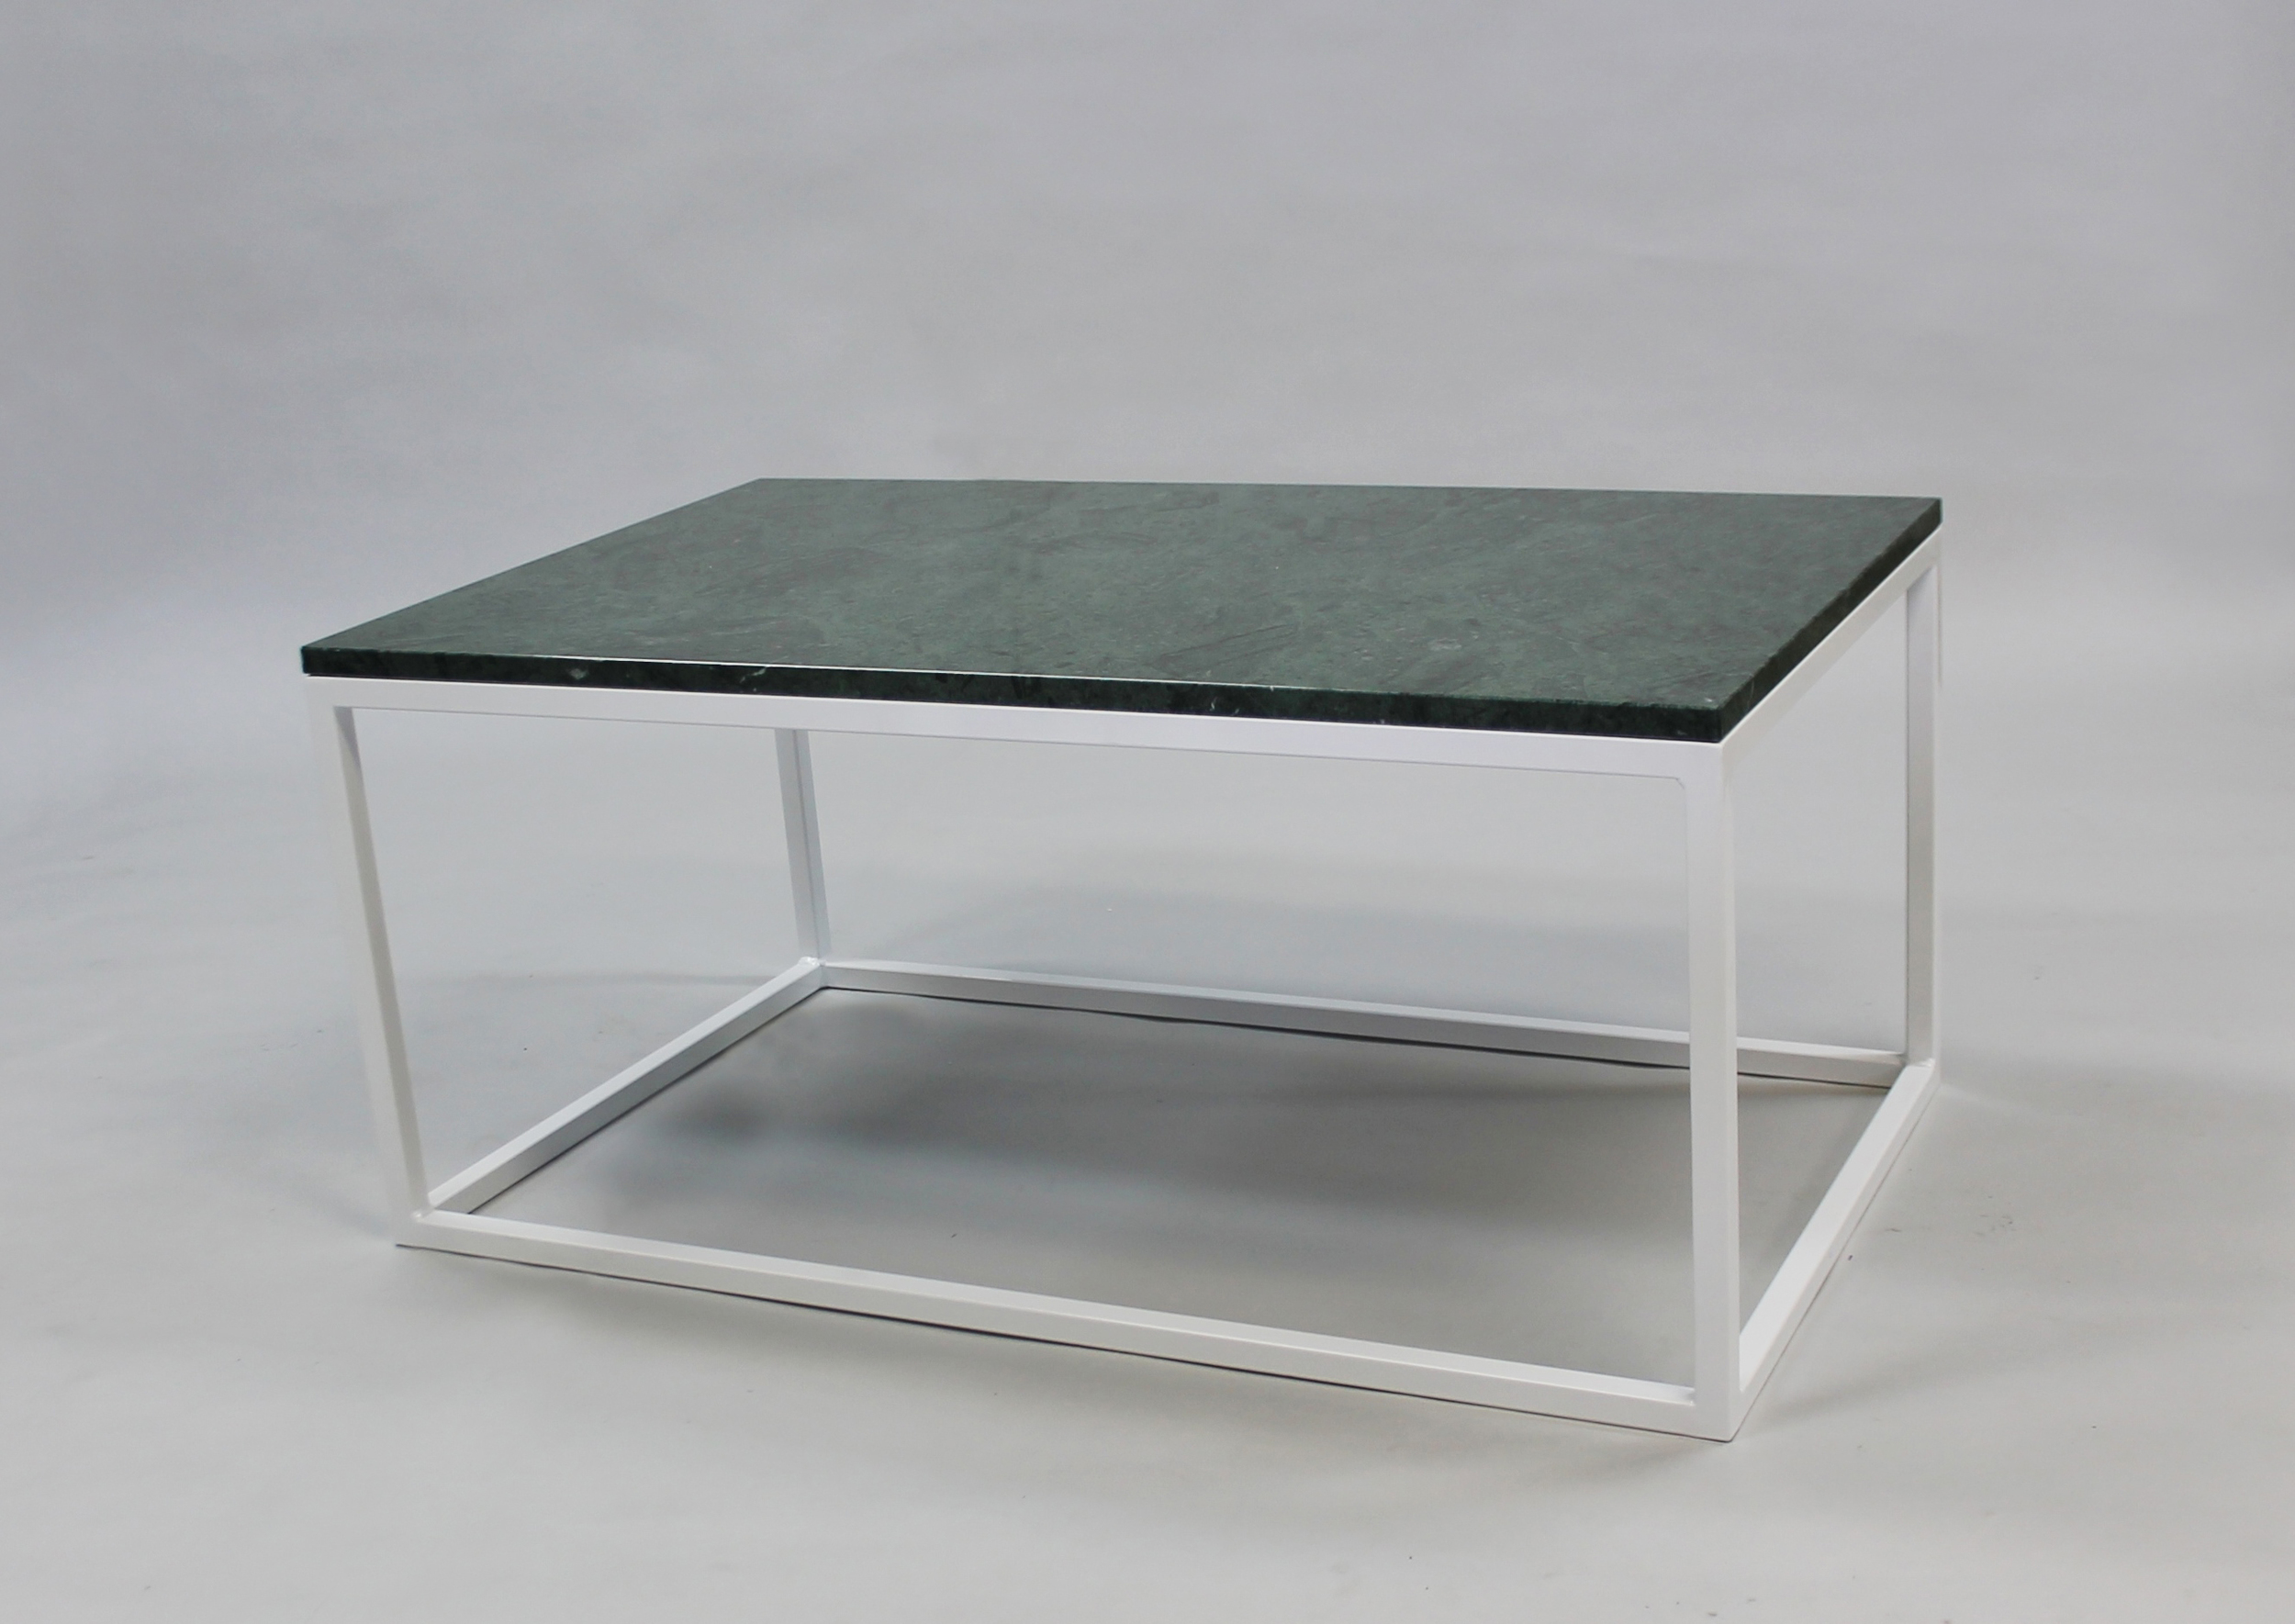 Marmorbord  GRÖN 100x60 H 45, vitt kub underrede